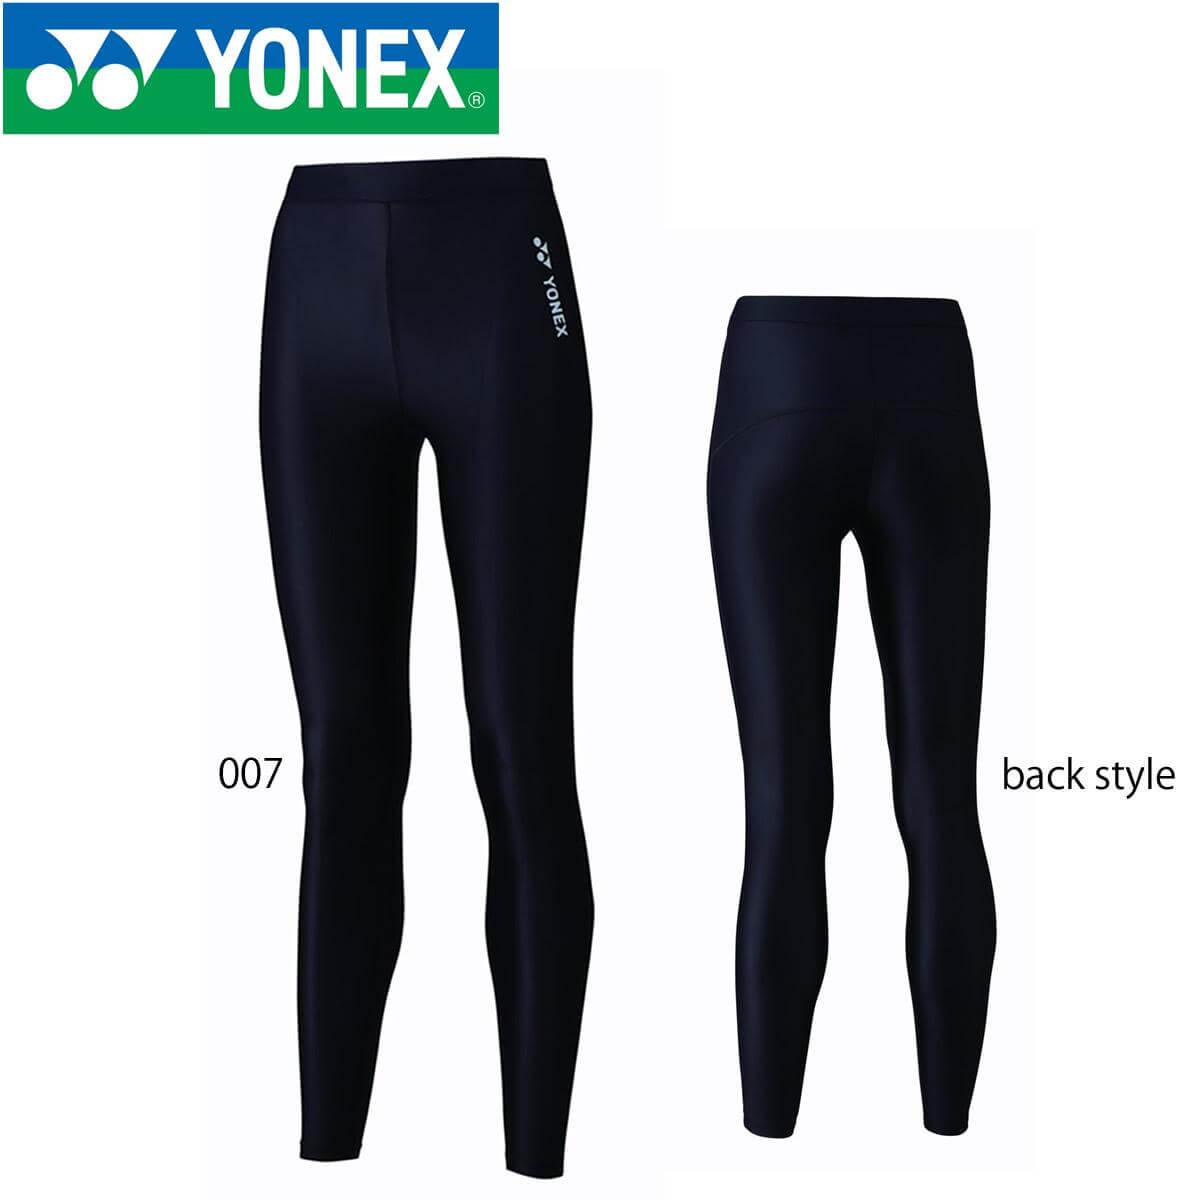 YONEX STBF2516 ウィメンズロングスパッツ ウェア レディース テニス バドミントン 日本産 2019FW 日本バドミントン協会審査合格品 メール便可 取り寄せ ヨネックス 日本メーカー新品 2021SS